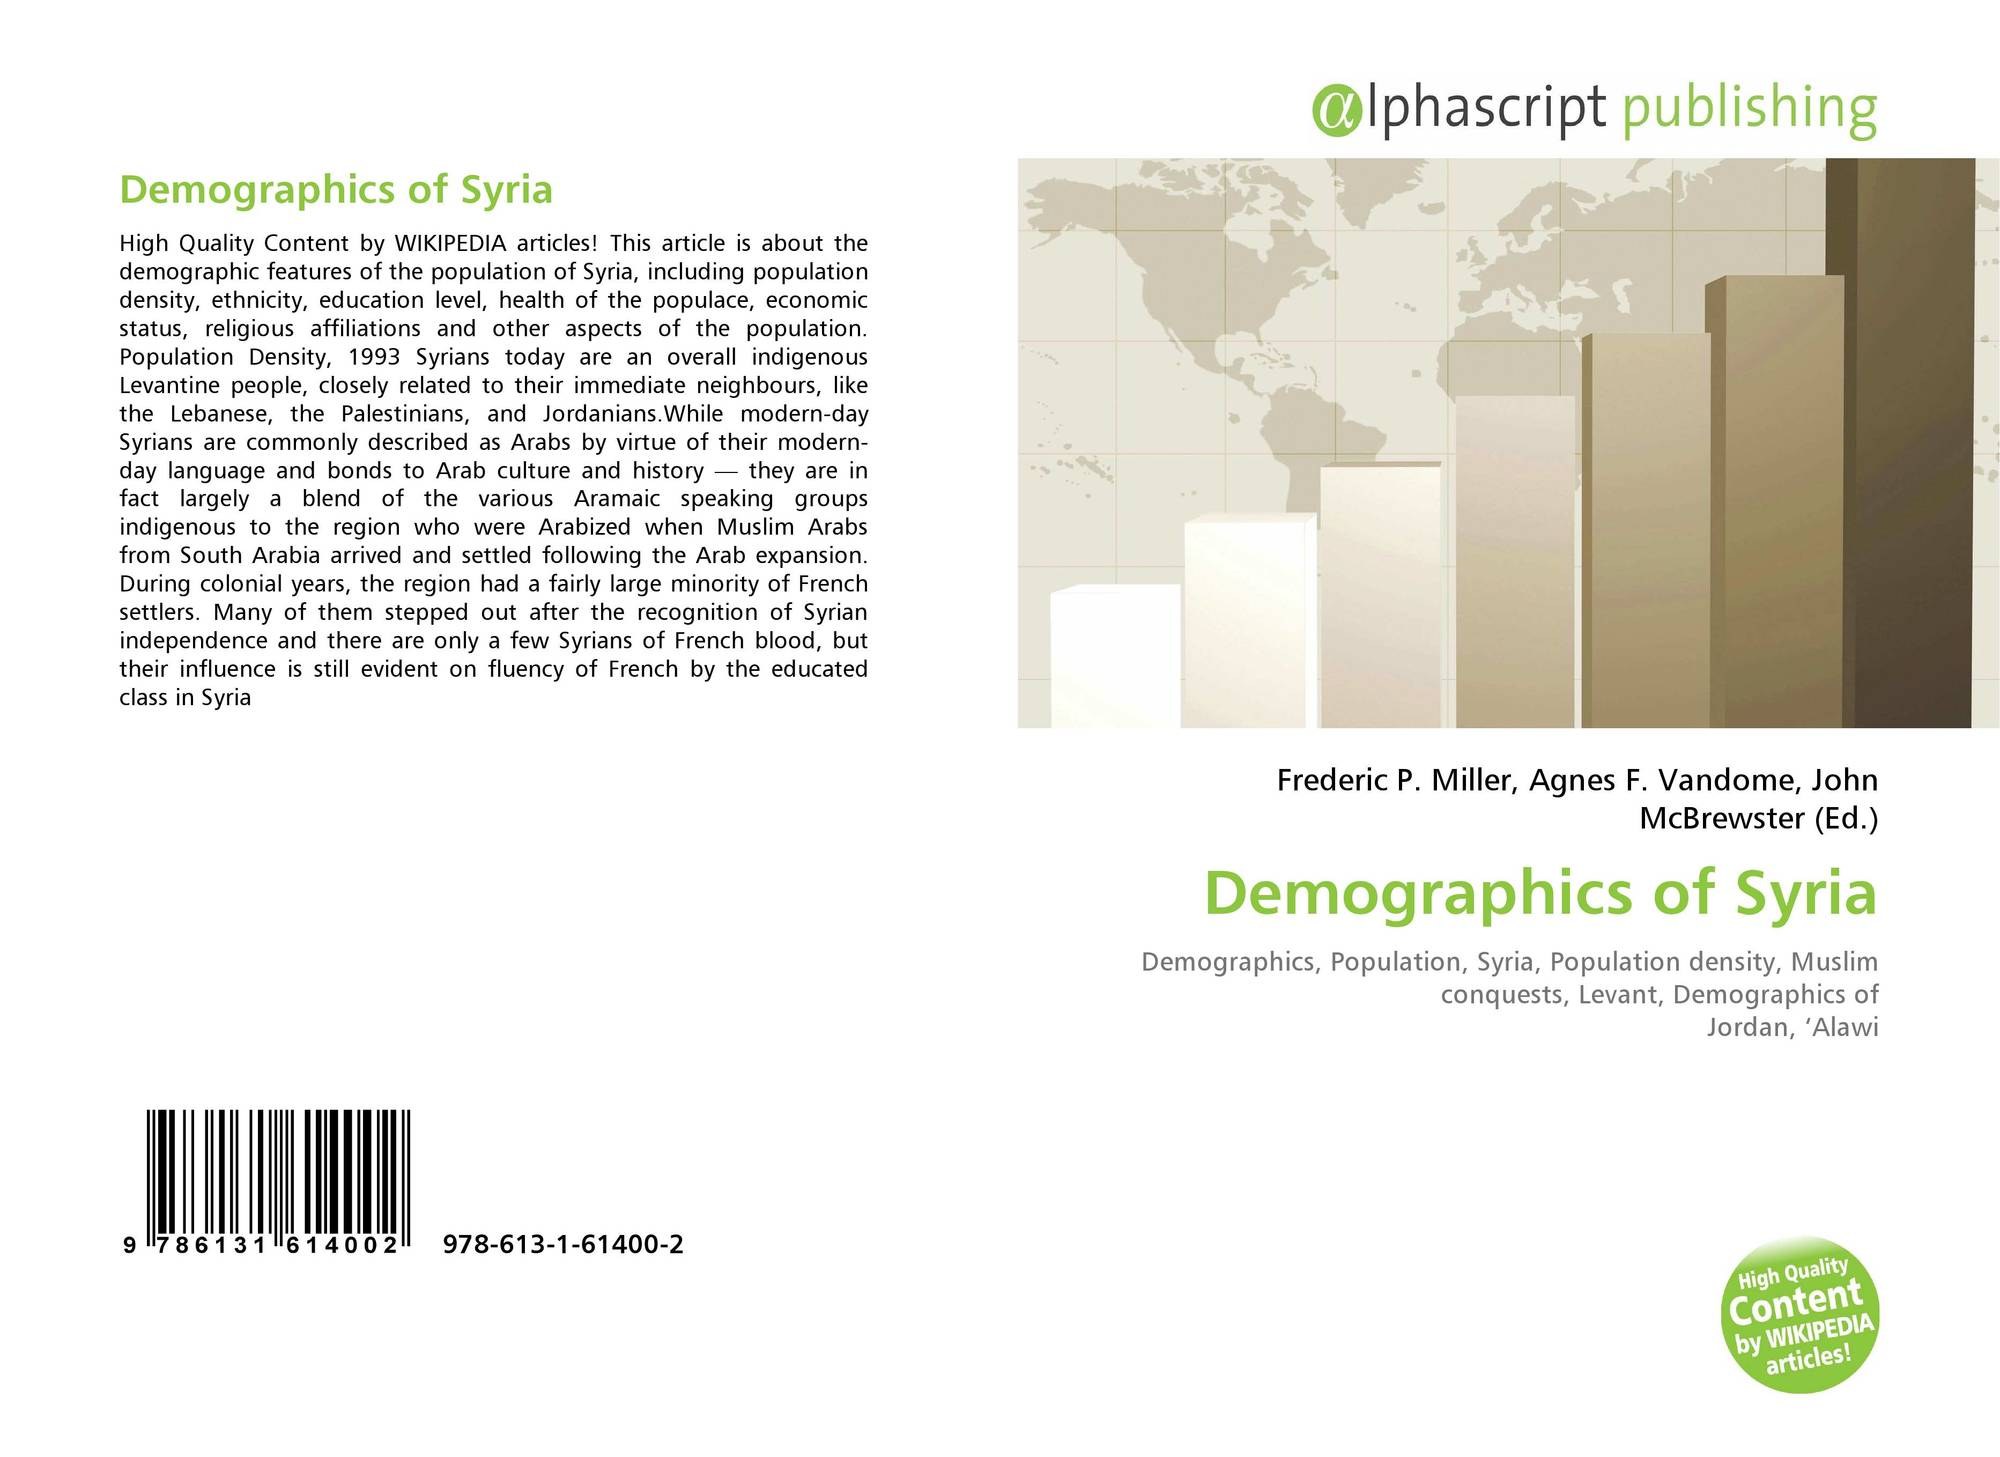 Demographics of Syria, 978-613-1-61400-2, 6131614008